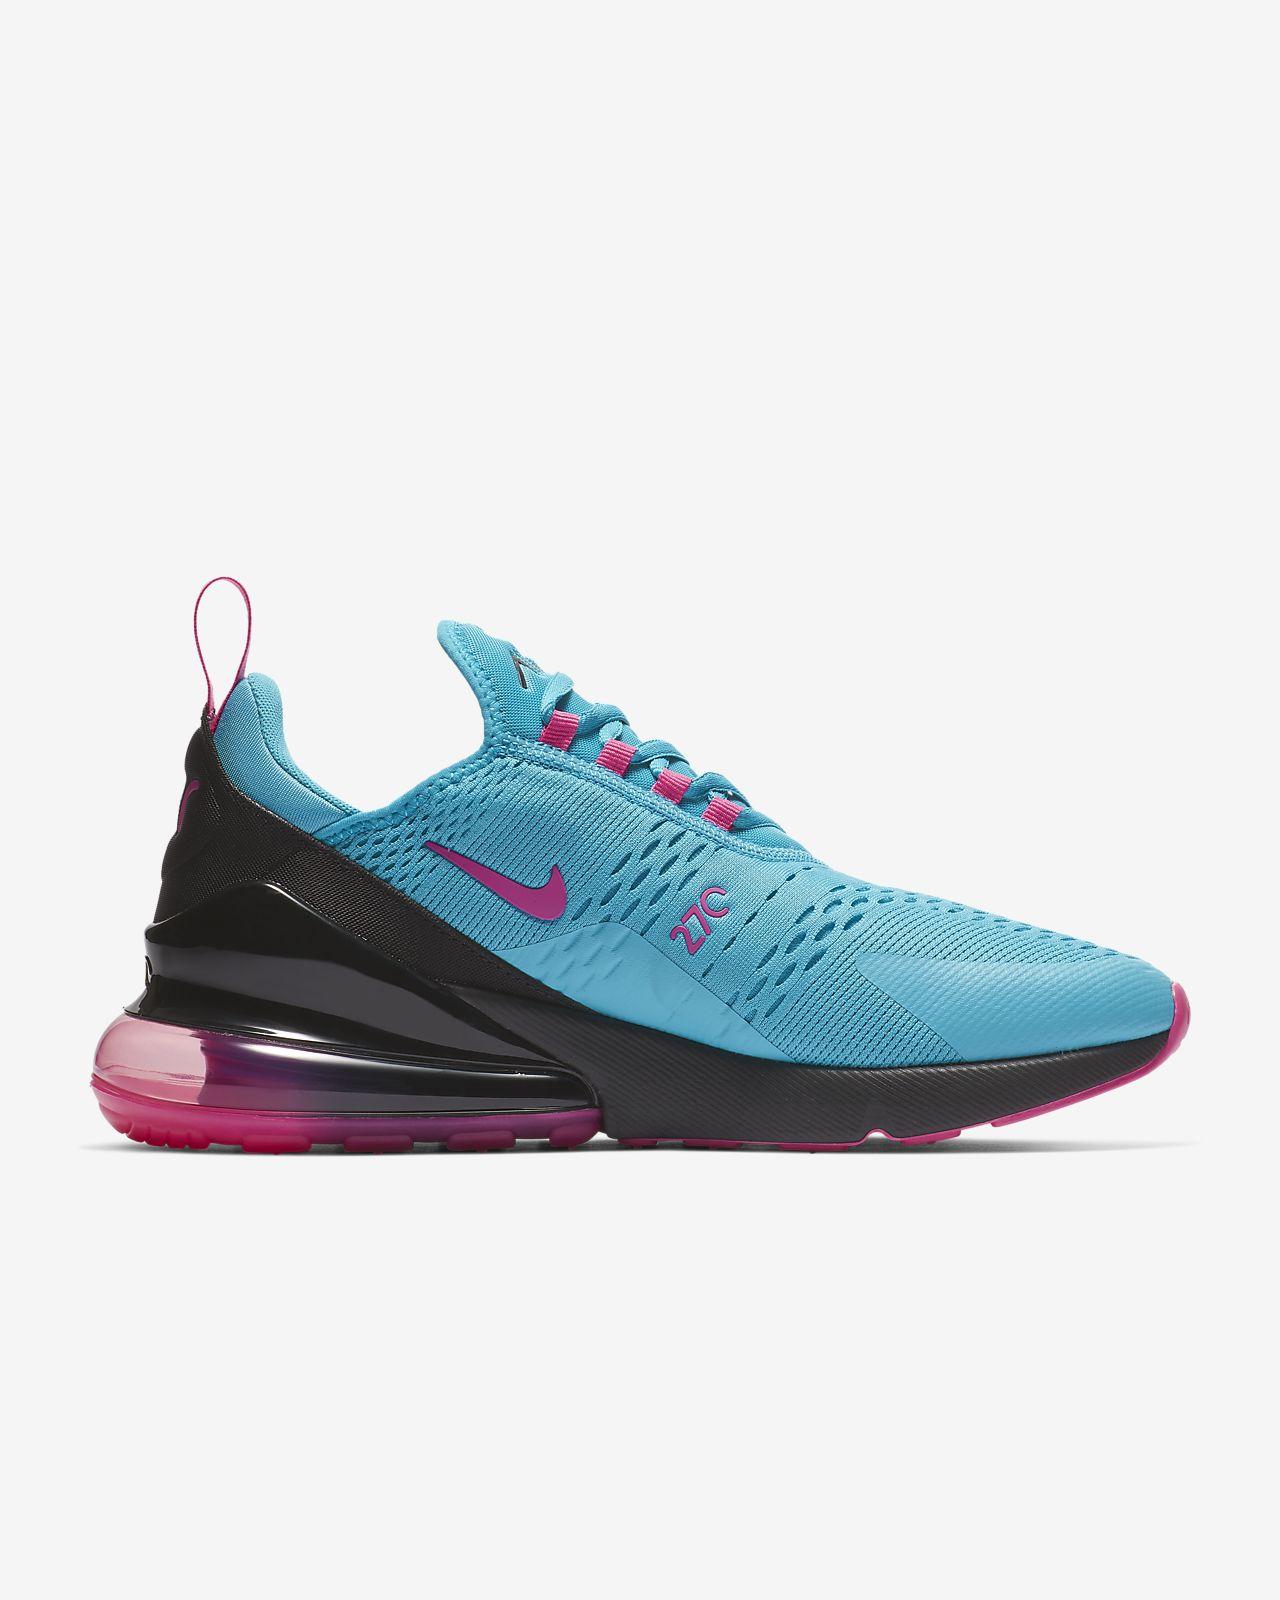 the best attitude 805a8 38961 Nike Air Max 270 Men's Shoe